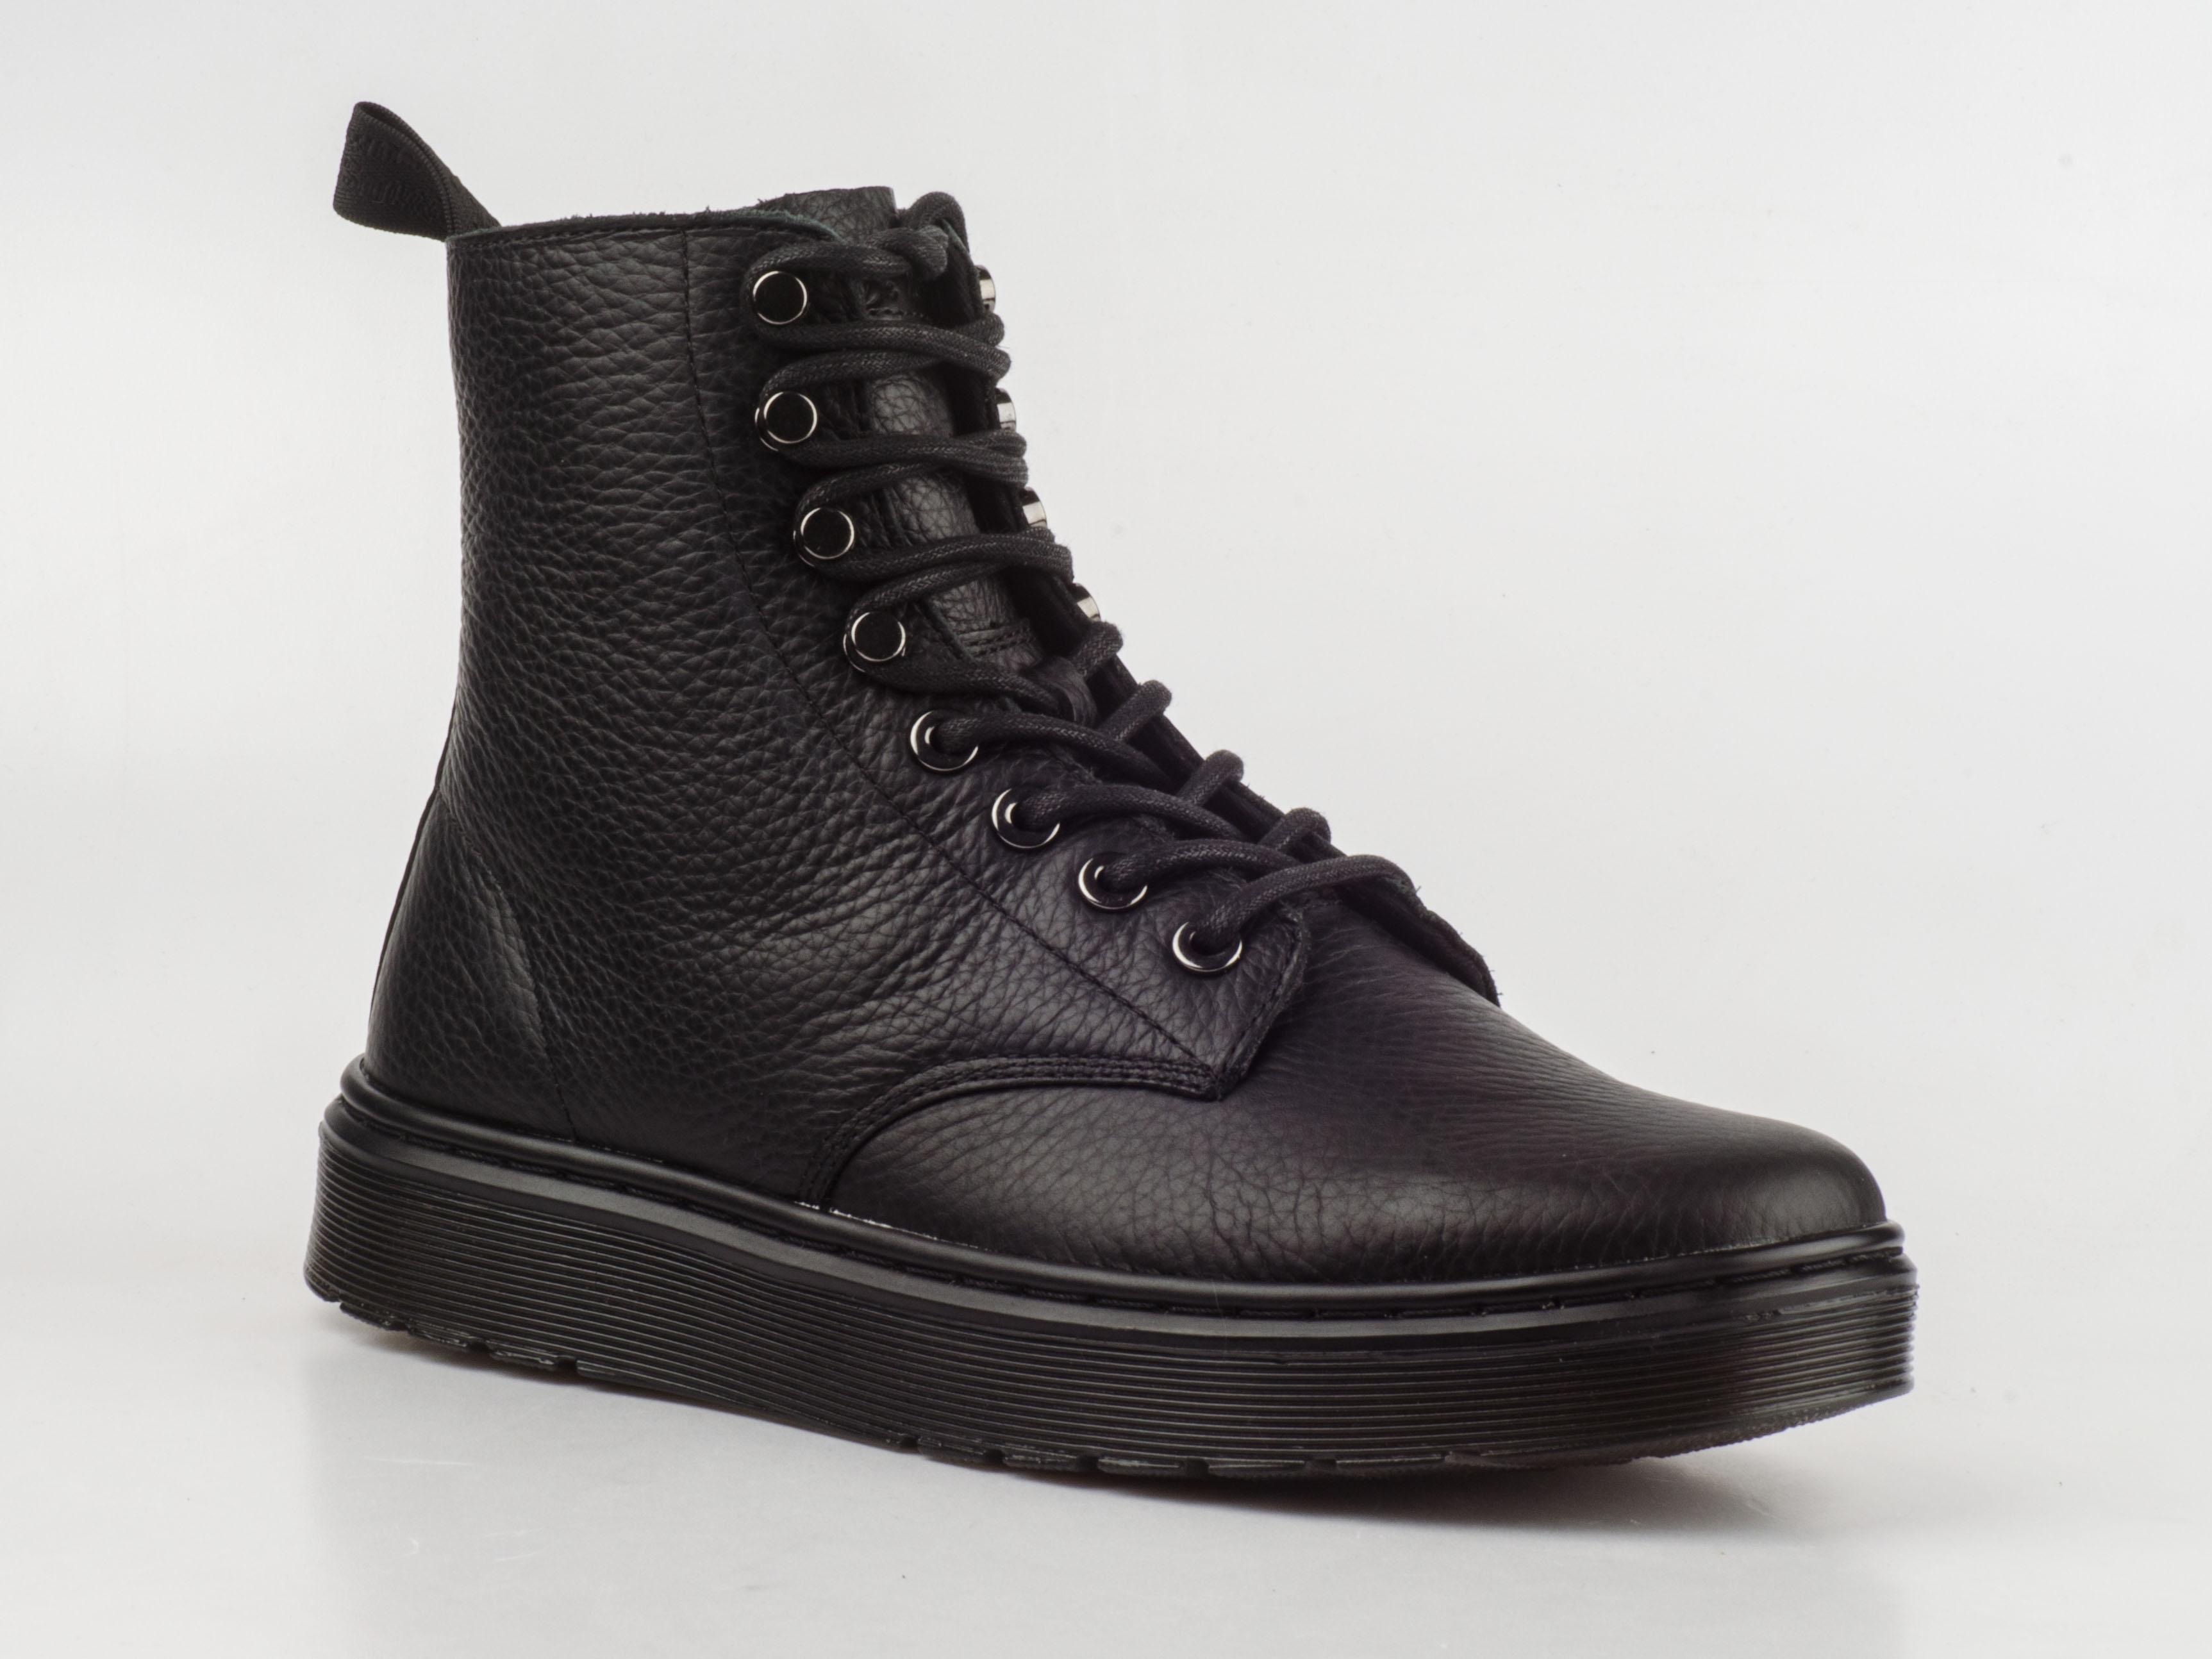 dr doc martens stiefel 8 tie boots disc montreal lux. Black Bedroom Furniture Sets. Home Design Ideas